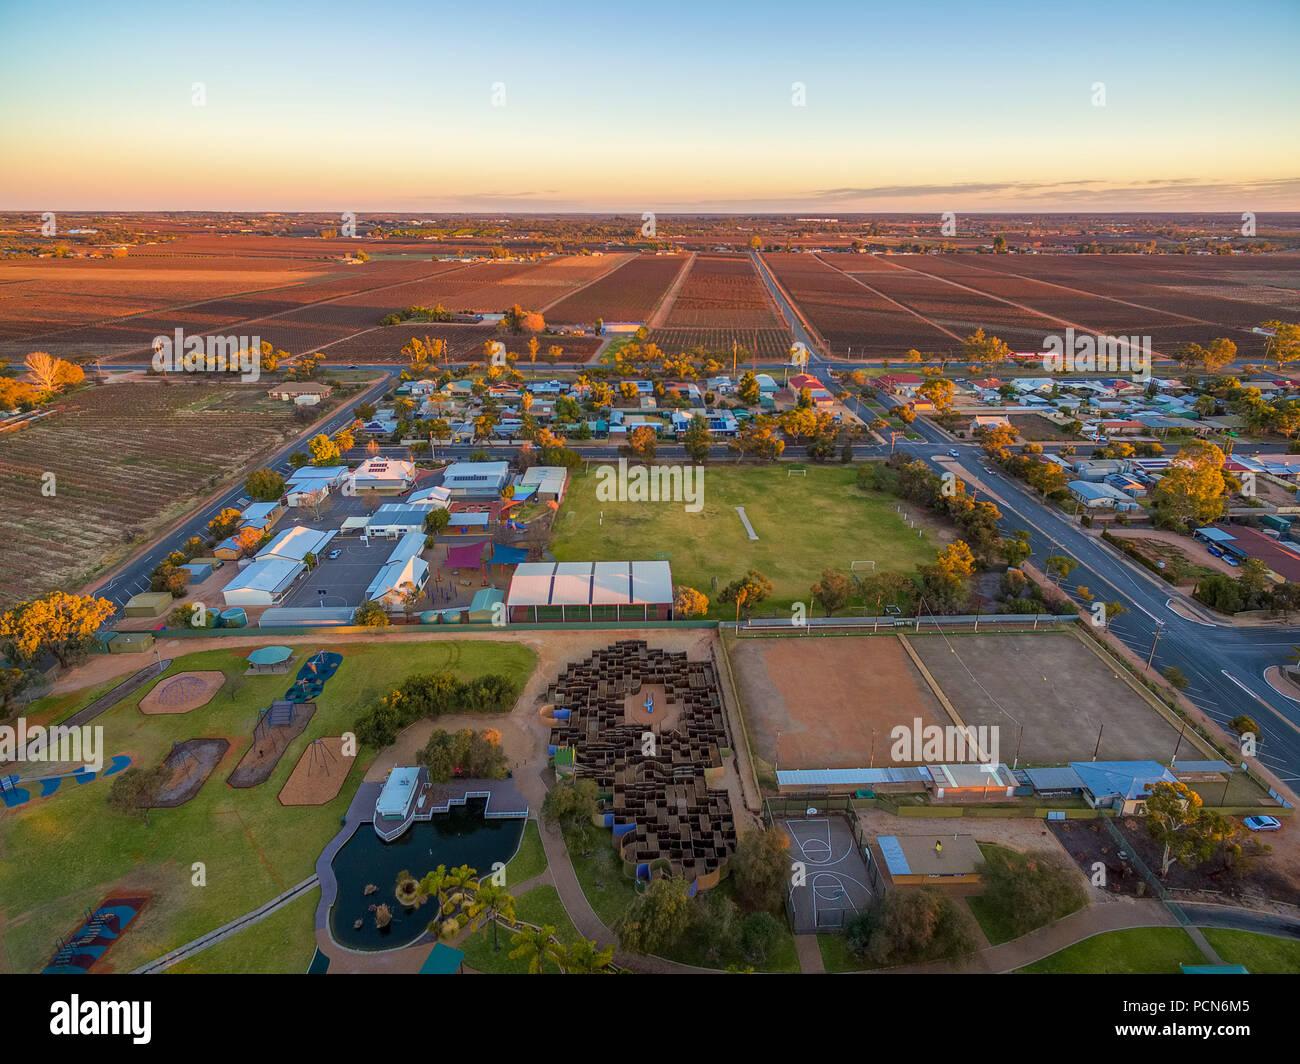 Aerial view of Monash adventure park, Riverland, South Australia Stock Photo